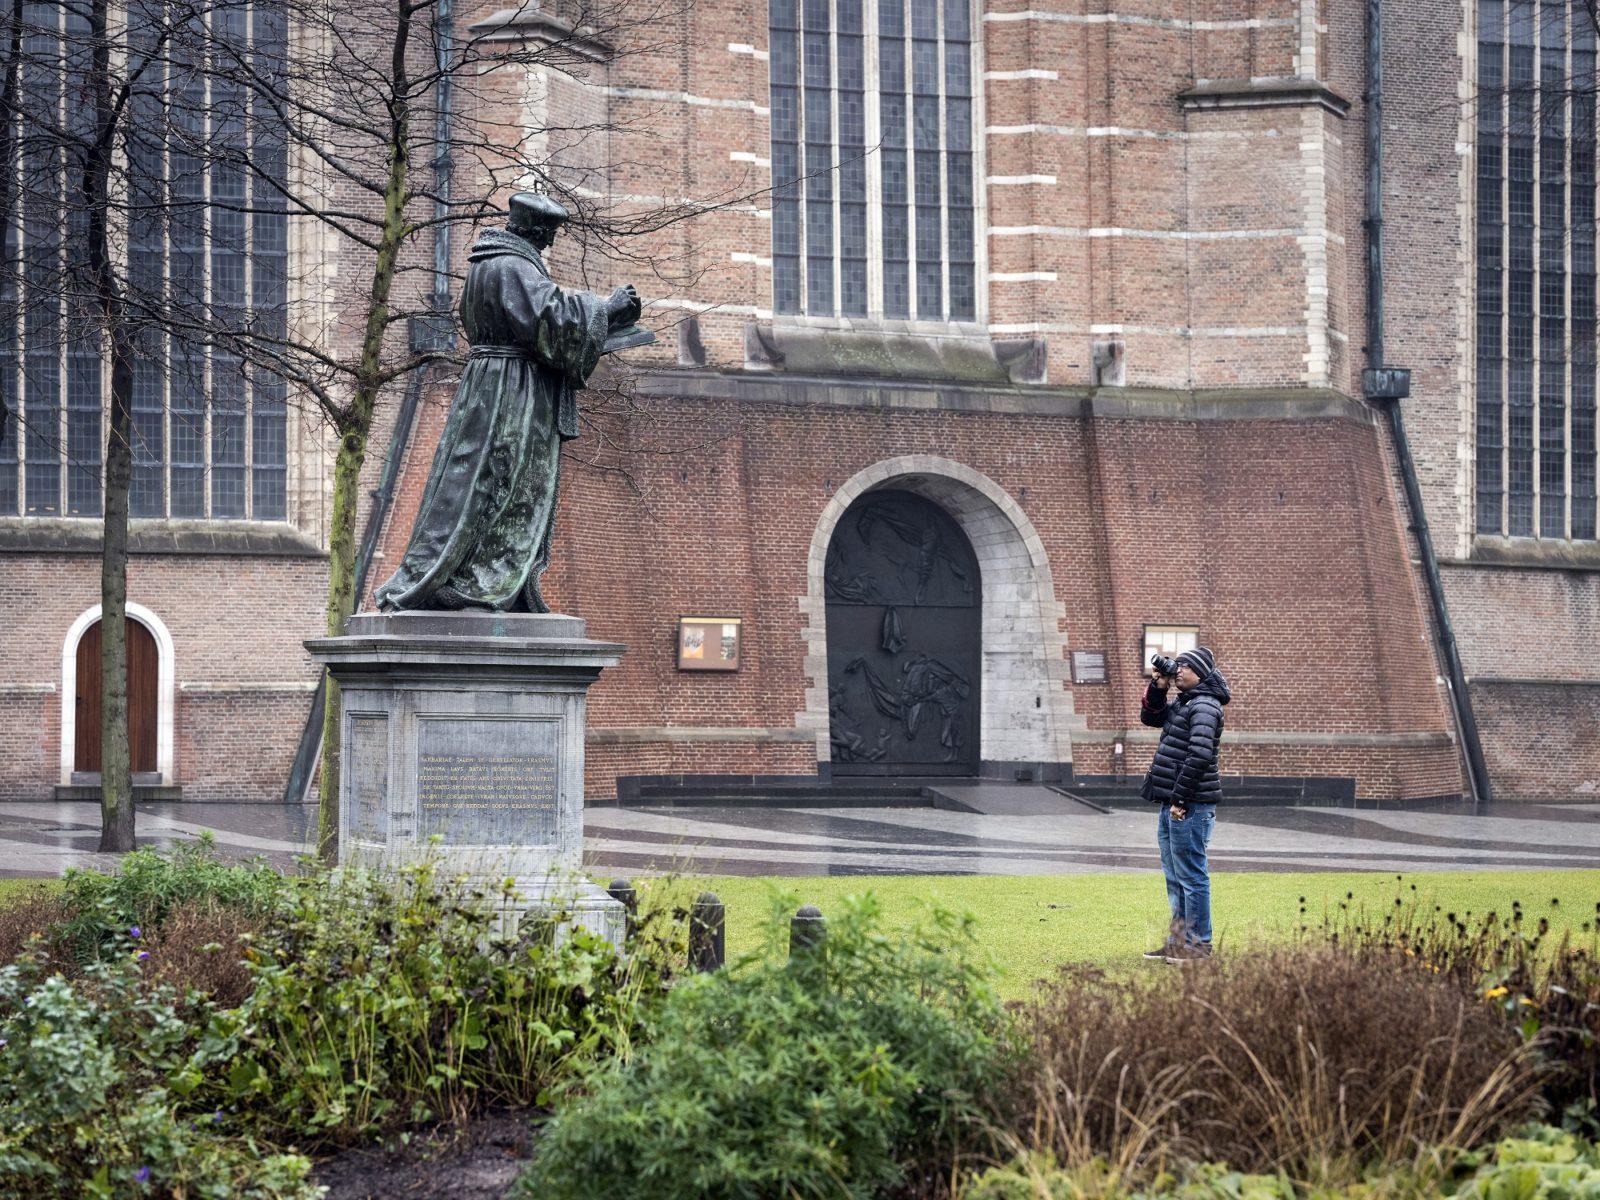 Erasmusbeeld-Rotterdam-1117-009